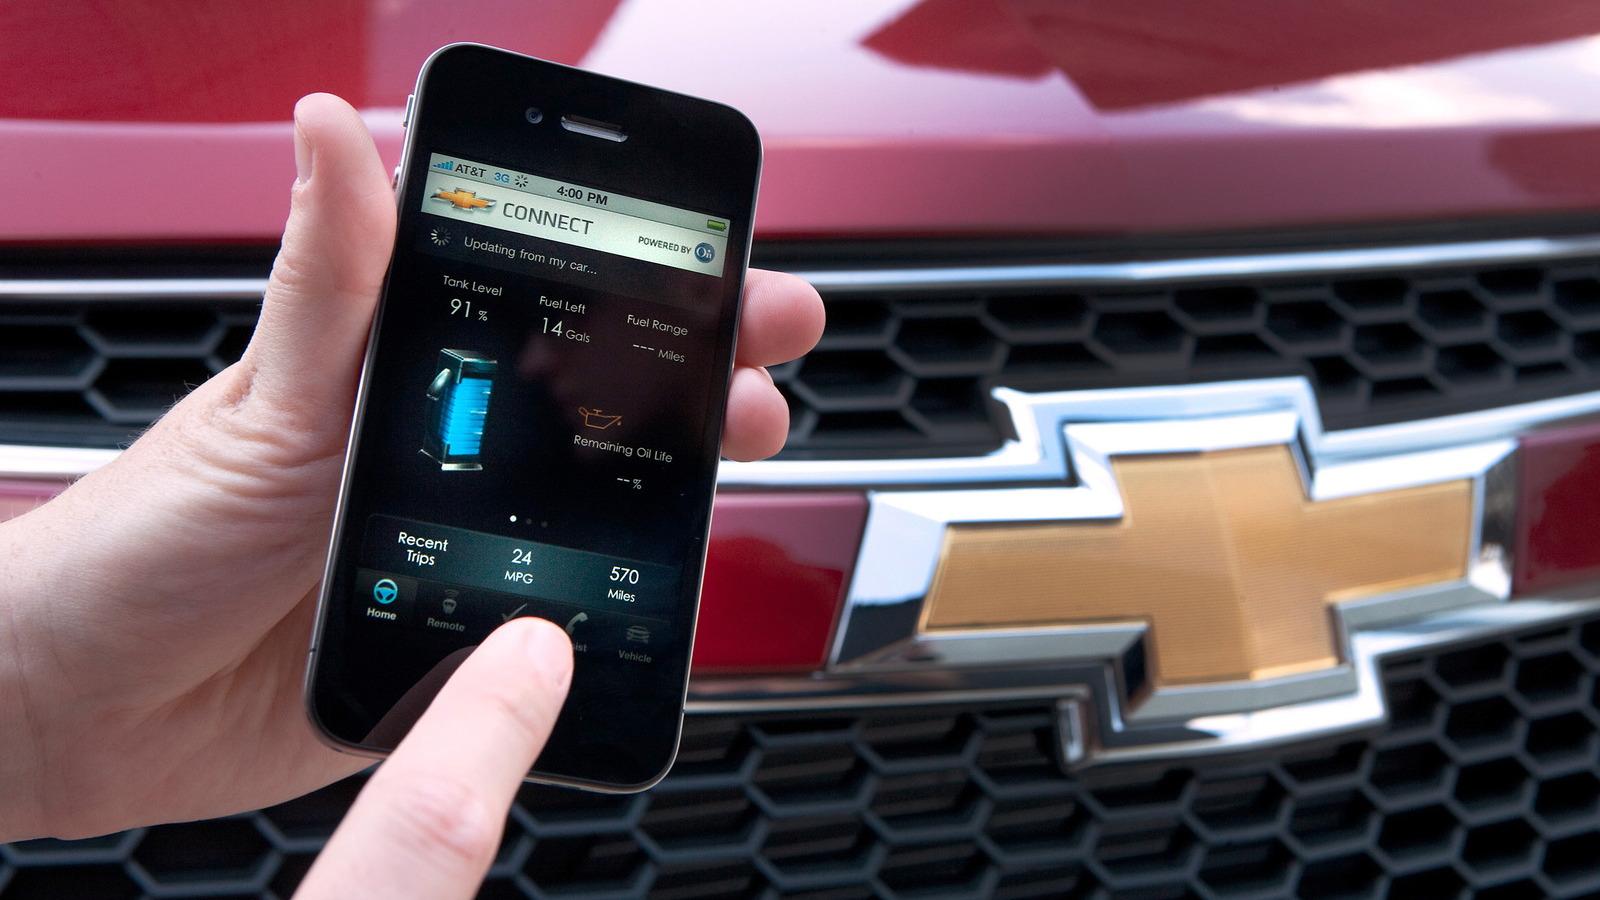 GM's OnStar smartphone app technology